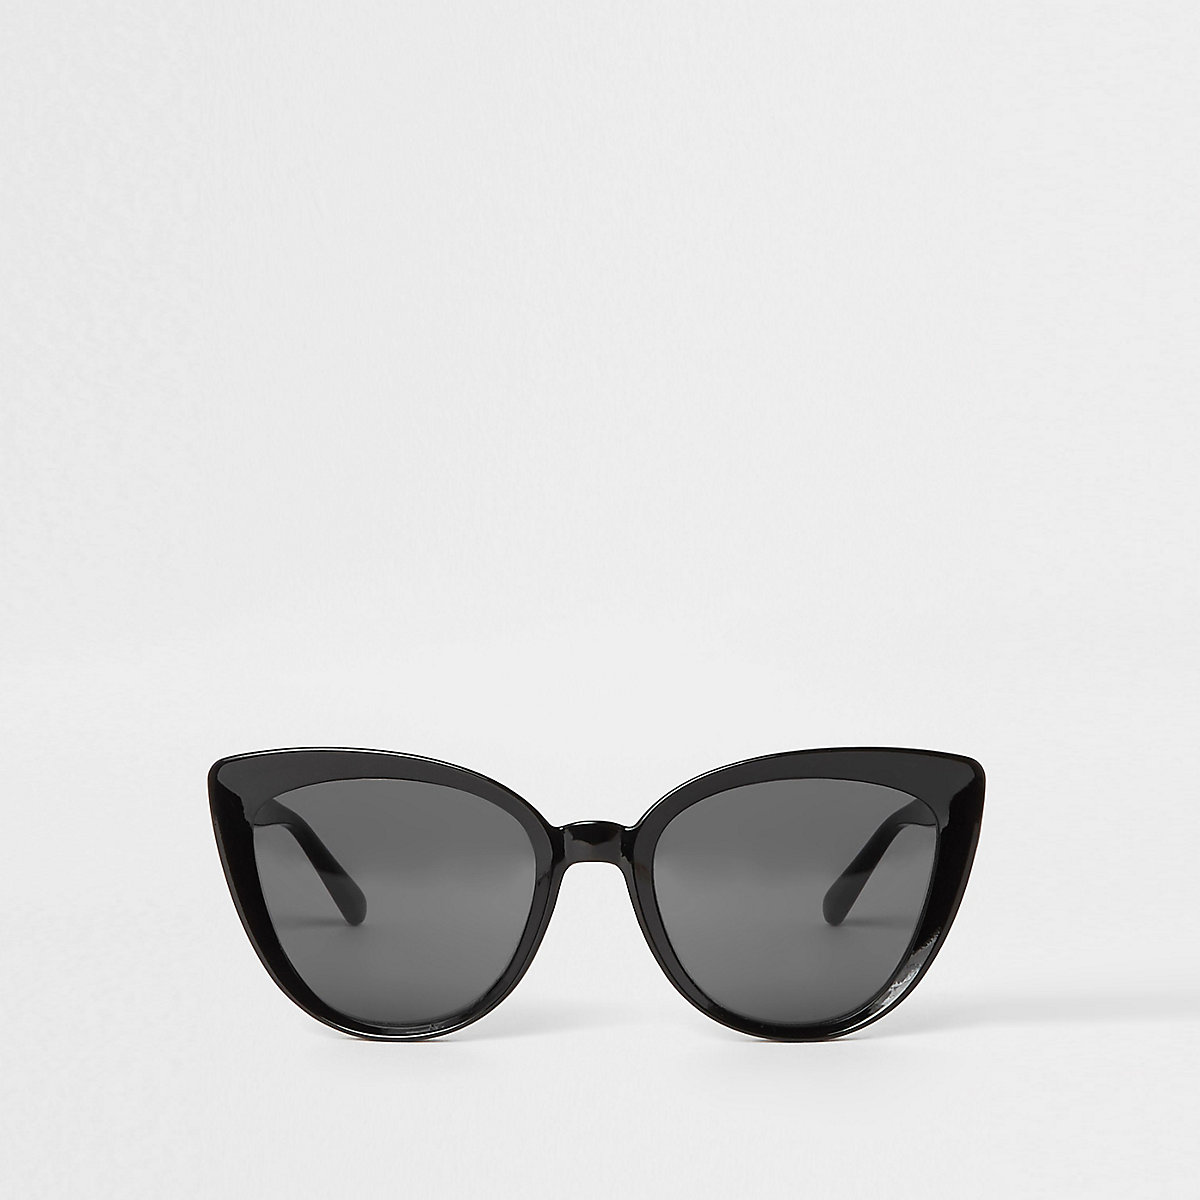 77241c170b1 Black smoke lens cat eye sunglasses - Cat Eye Sunglasses - Sunglasses -  women